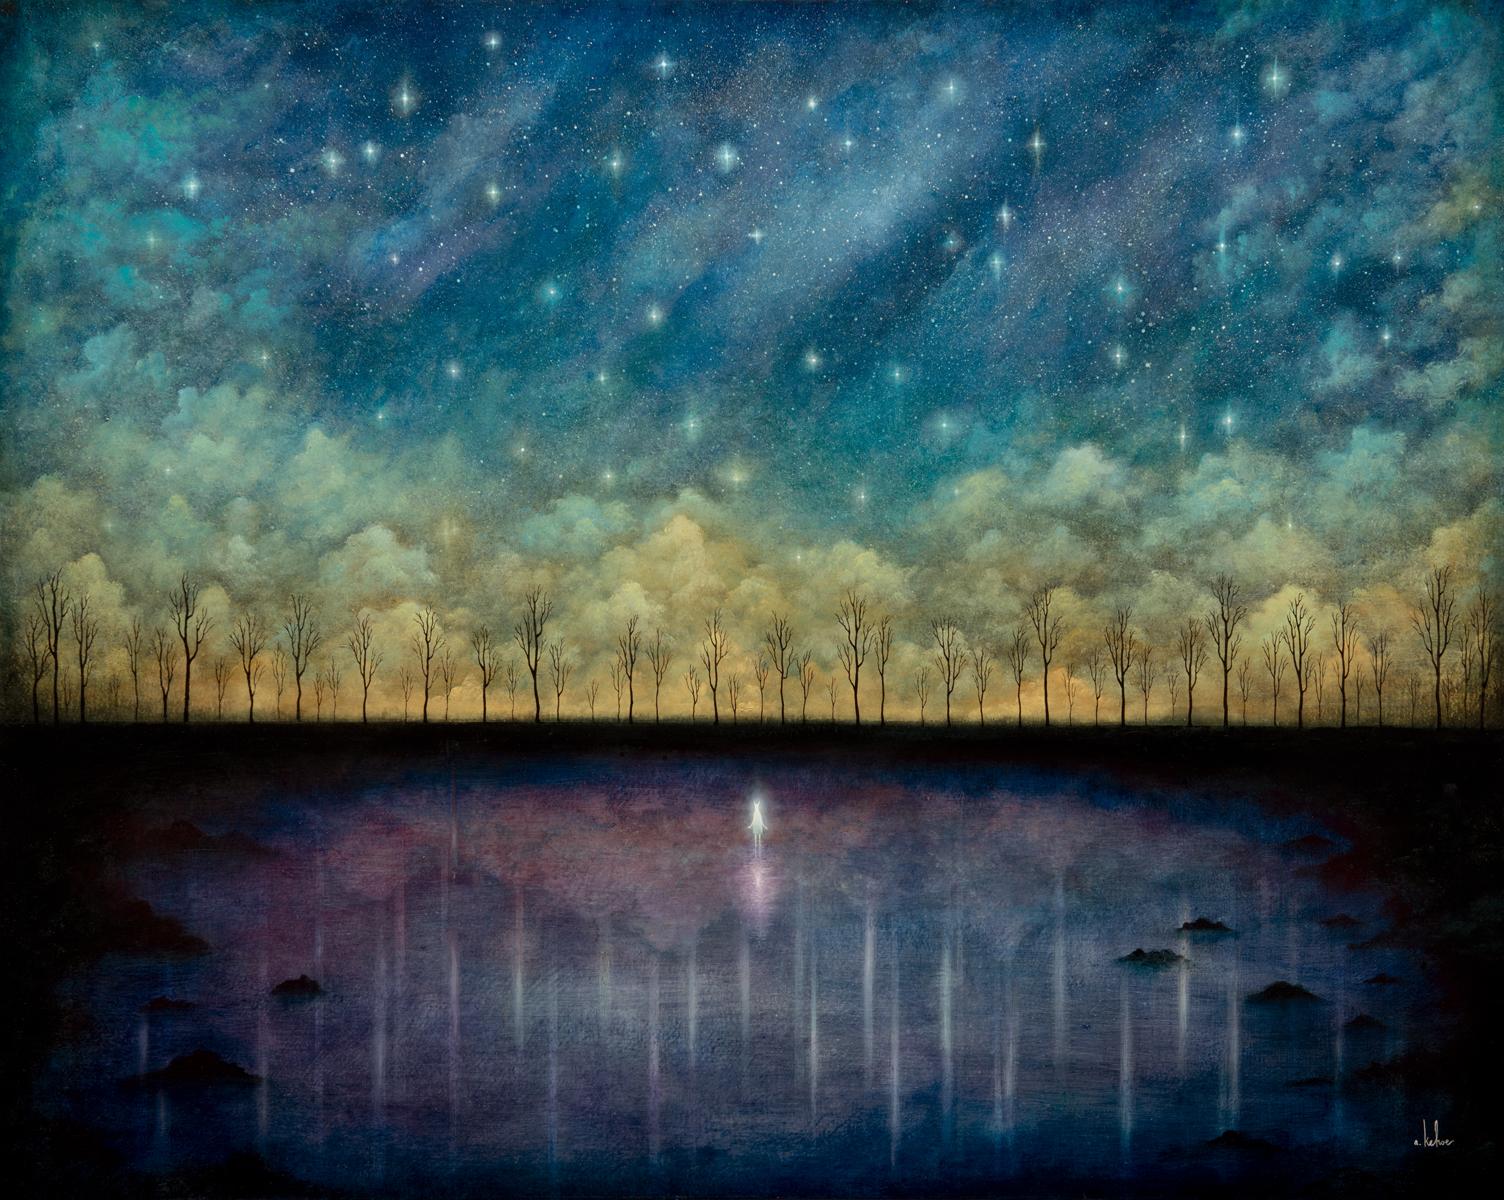 Andy-Kehoe_Celestial-Requiem-For-A-Fallen-Light